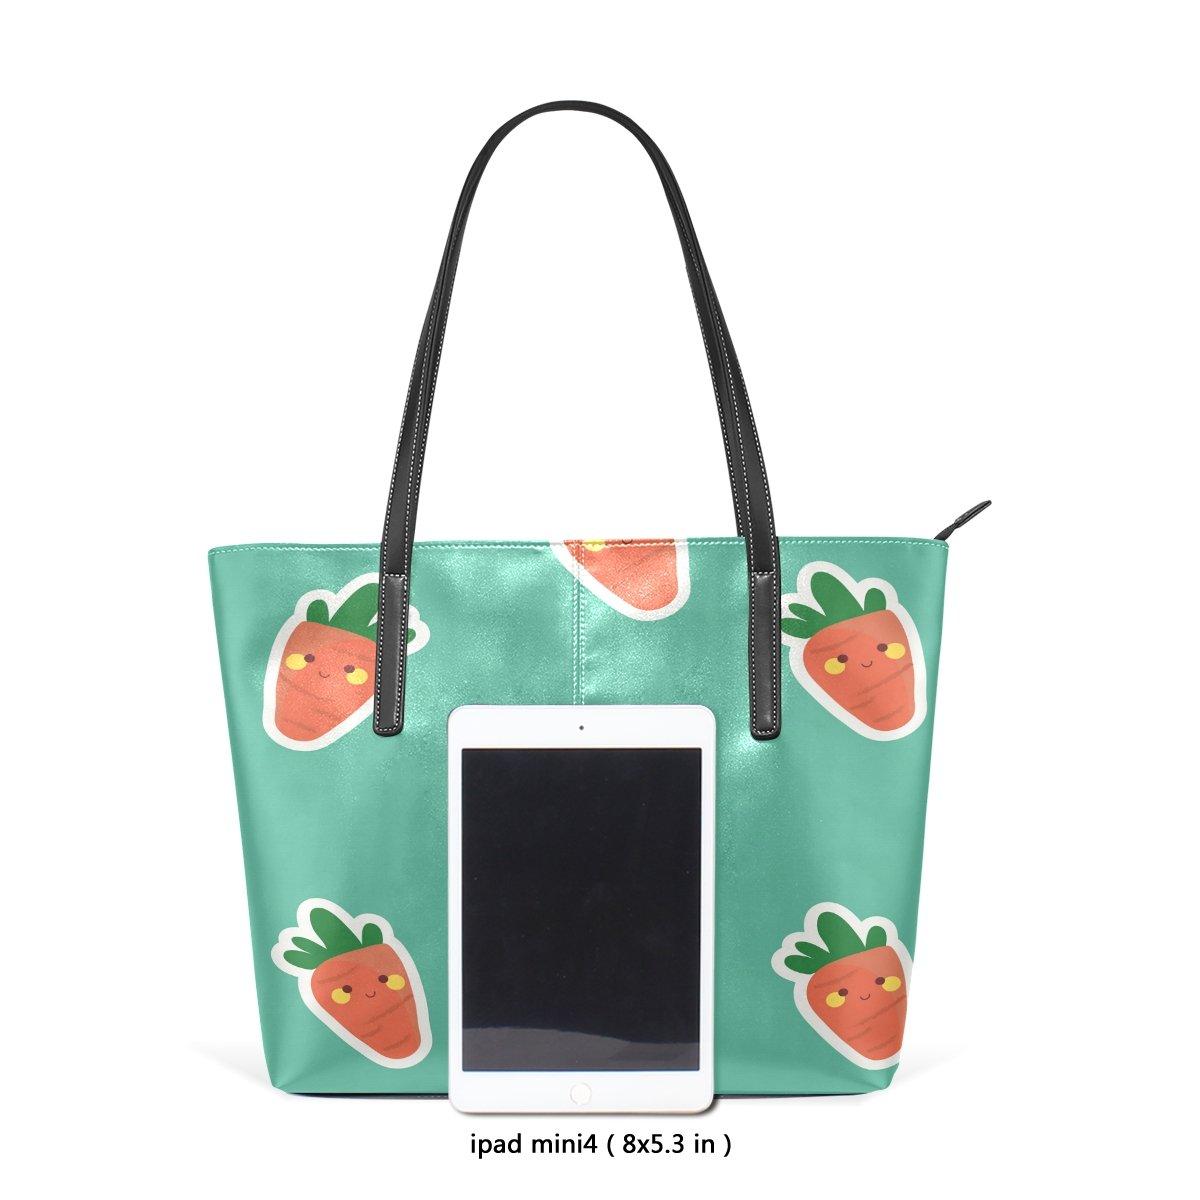 Womens Leather Handbags Cartoon Carrots Top Handle Shoulder Bags